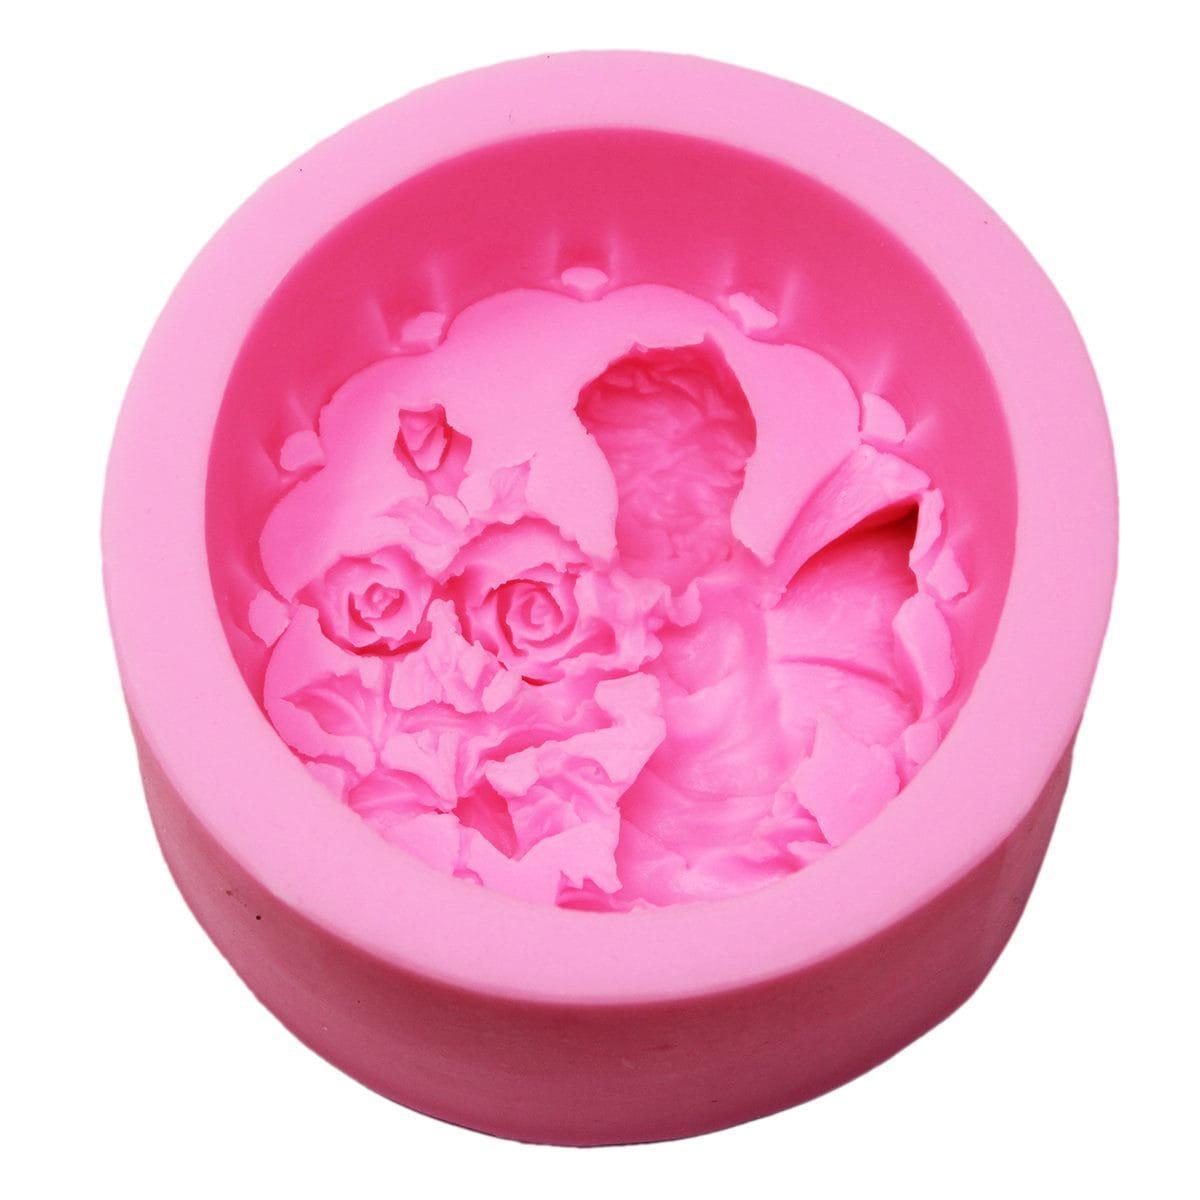 Resin Silicone Mould Boy Cupid Design